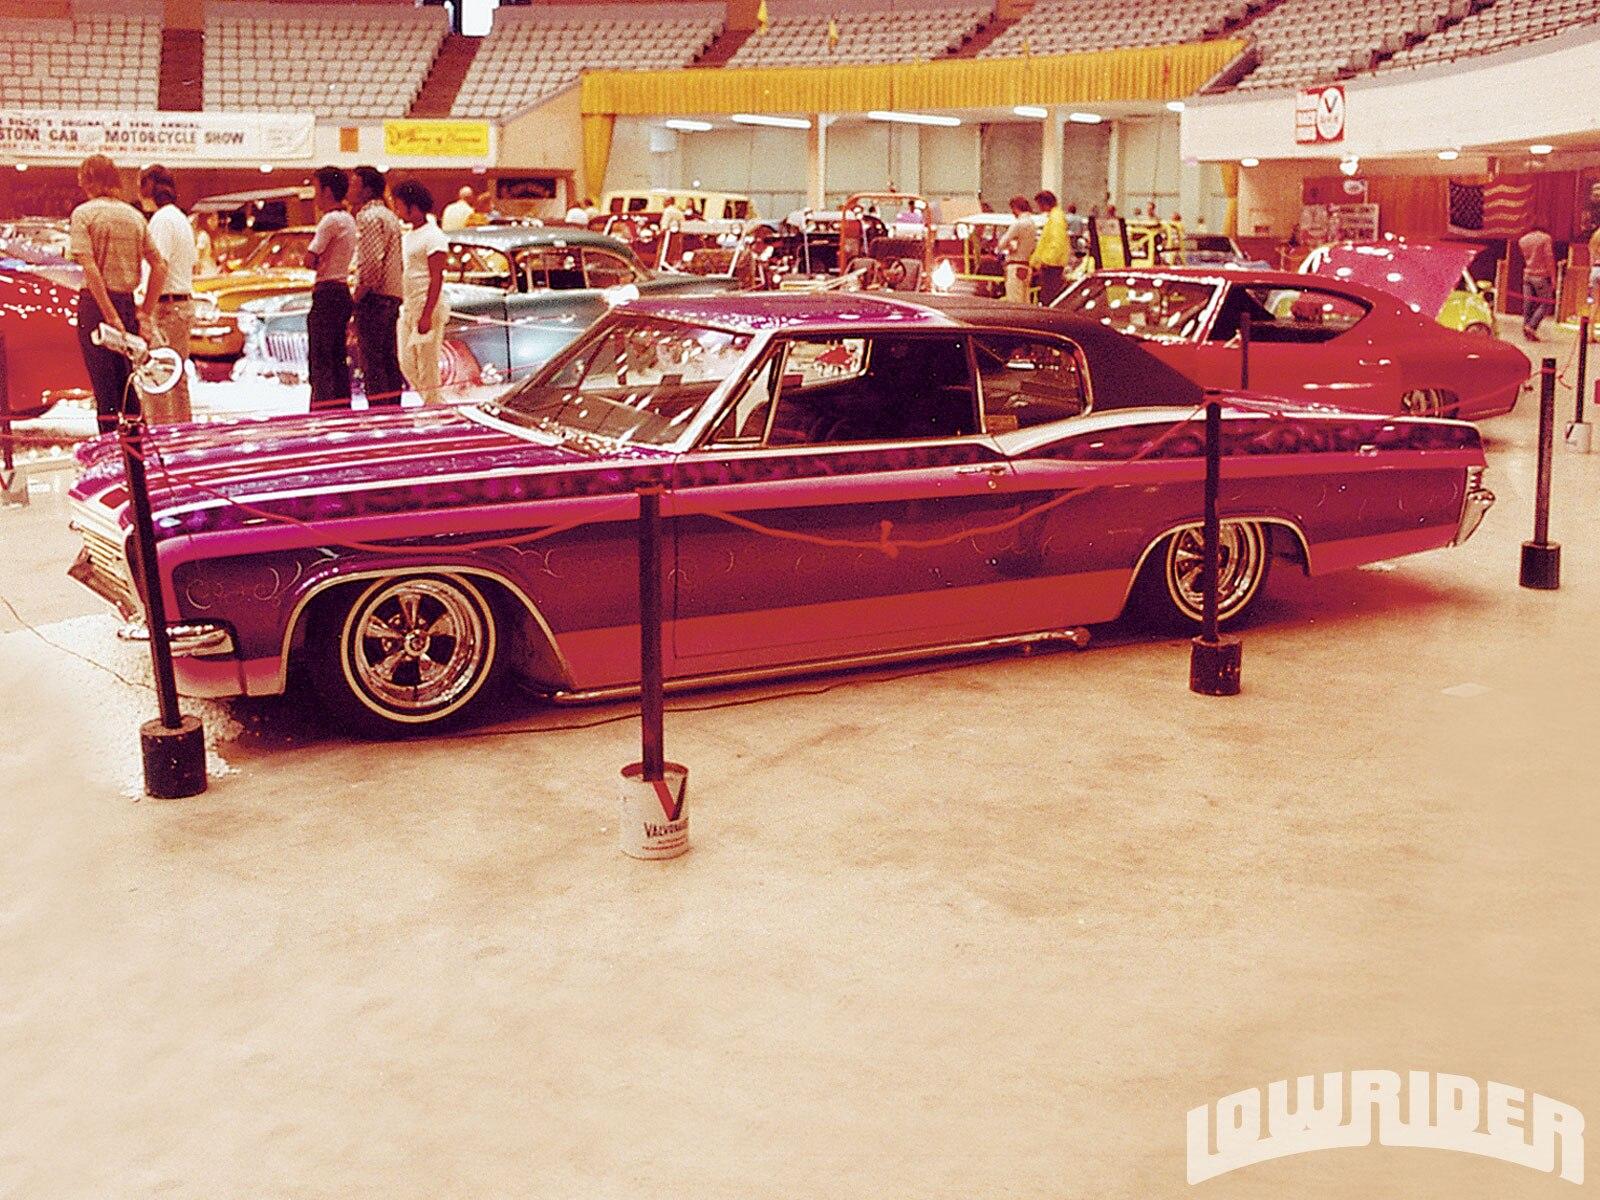 1963 Chevrolet Impala More Vintage Rides Lowrider Magazine